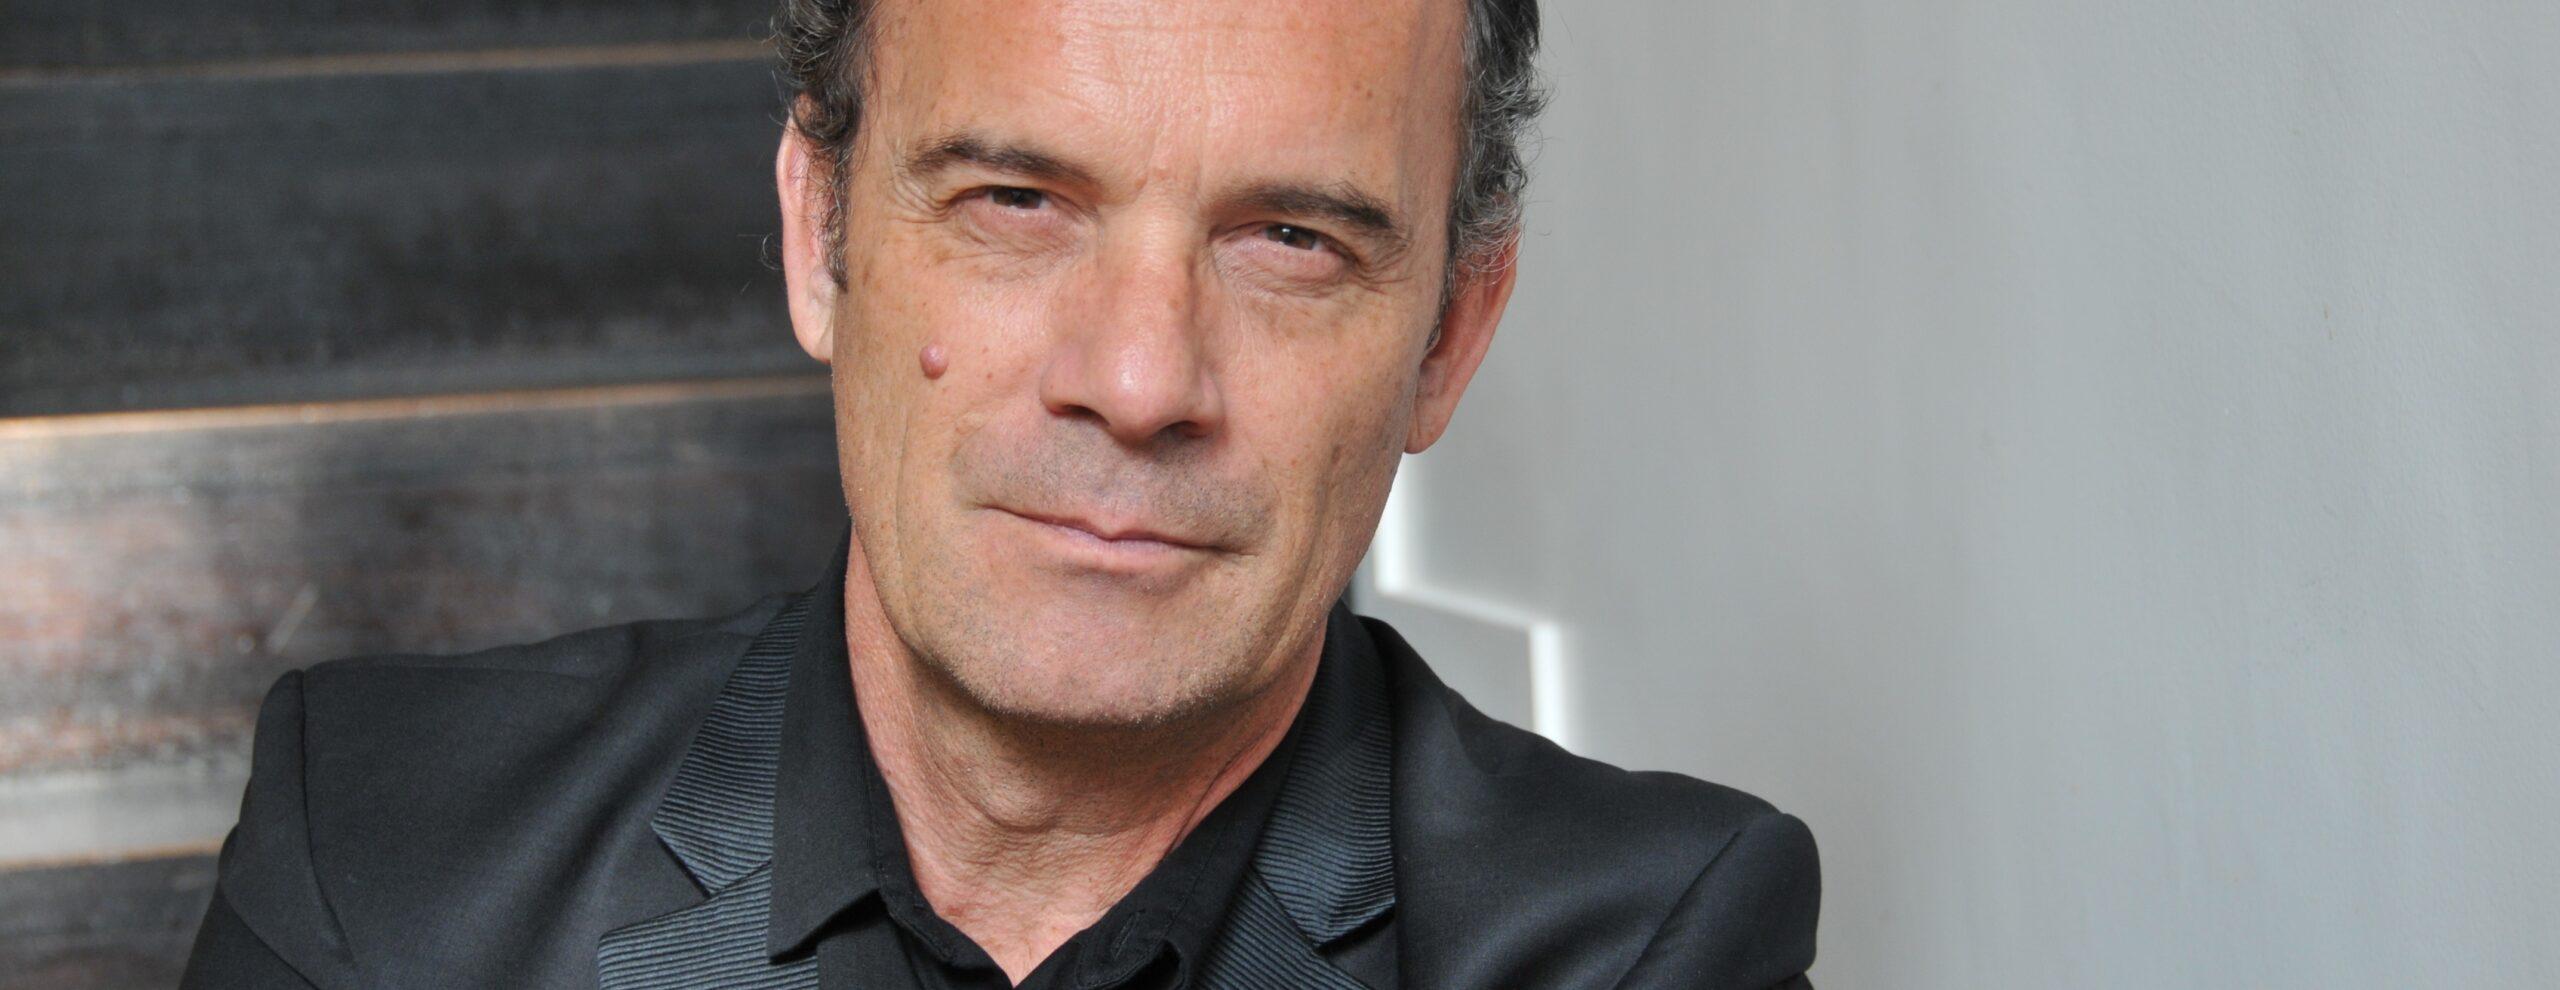 Franck Ollu - foto: Jean-Jacques Ollu